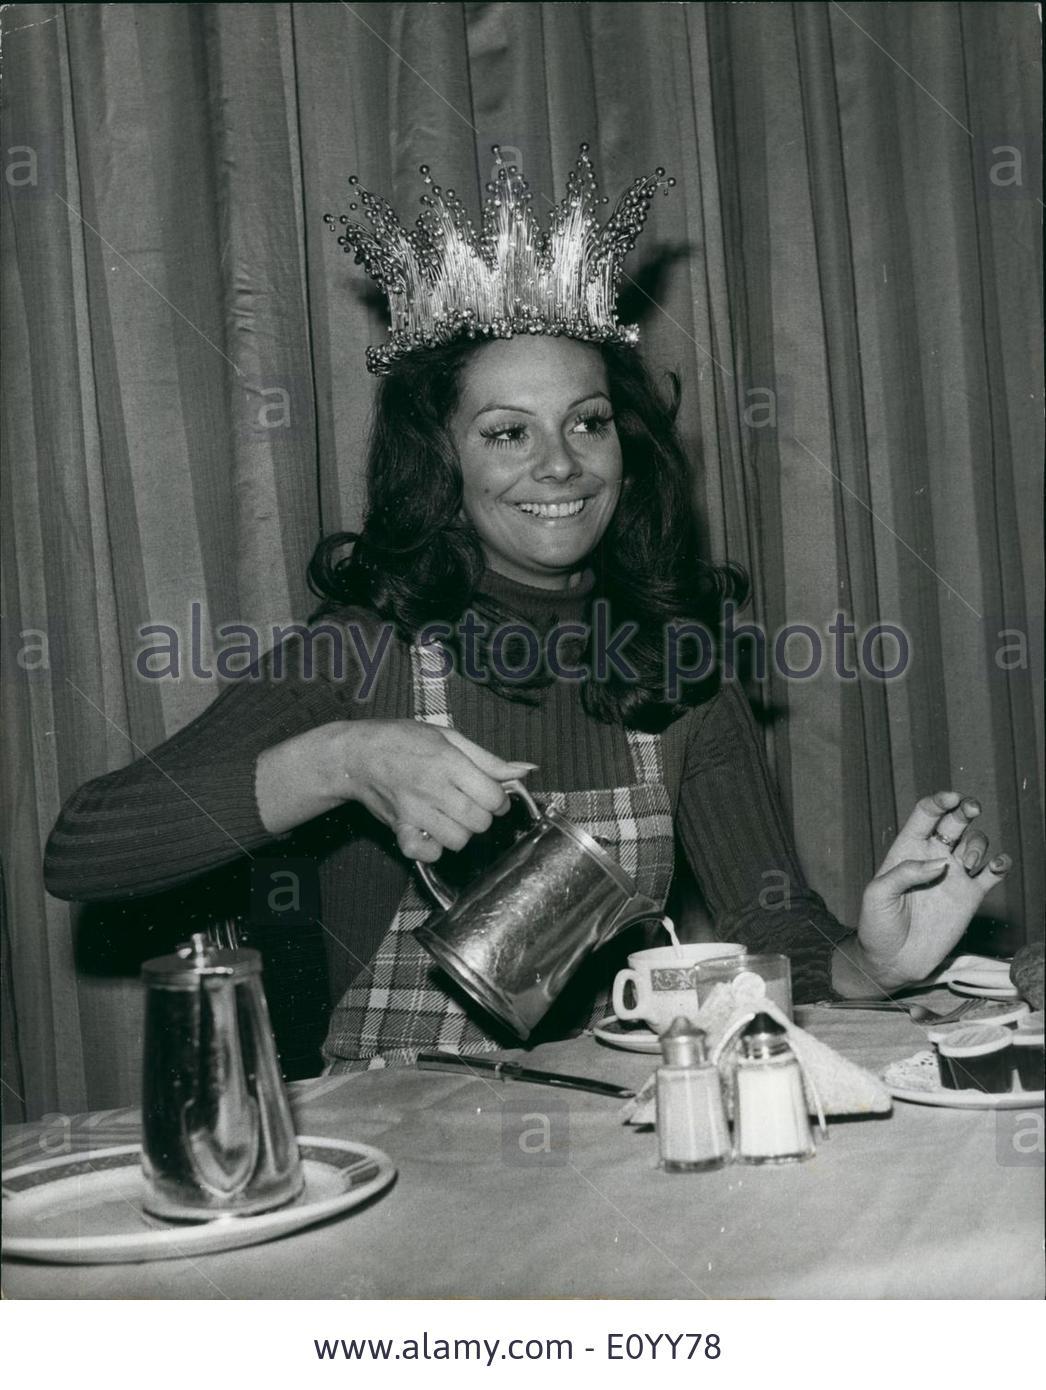 "˜*•. ˜""*°•.˜""*°••°* Lucia Petterle, Miss World 1971. ˜*•. ˜""*°•.˜""*°••°* Rfpflqrm"